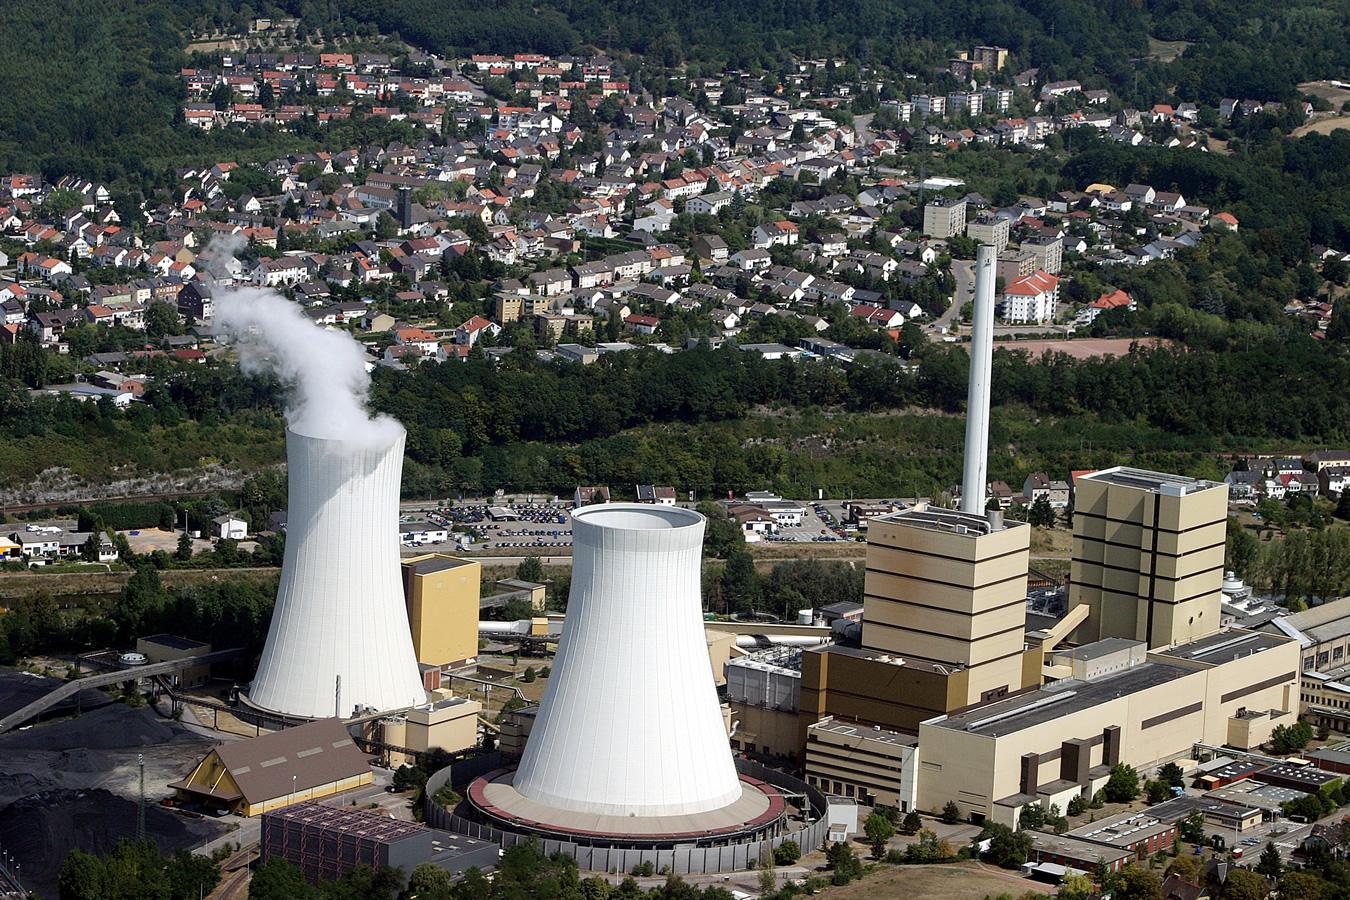 Modellkraftwerk Fenne